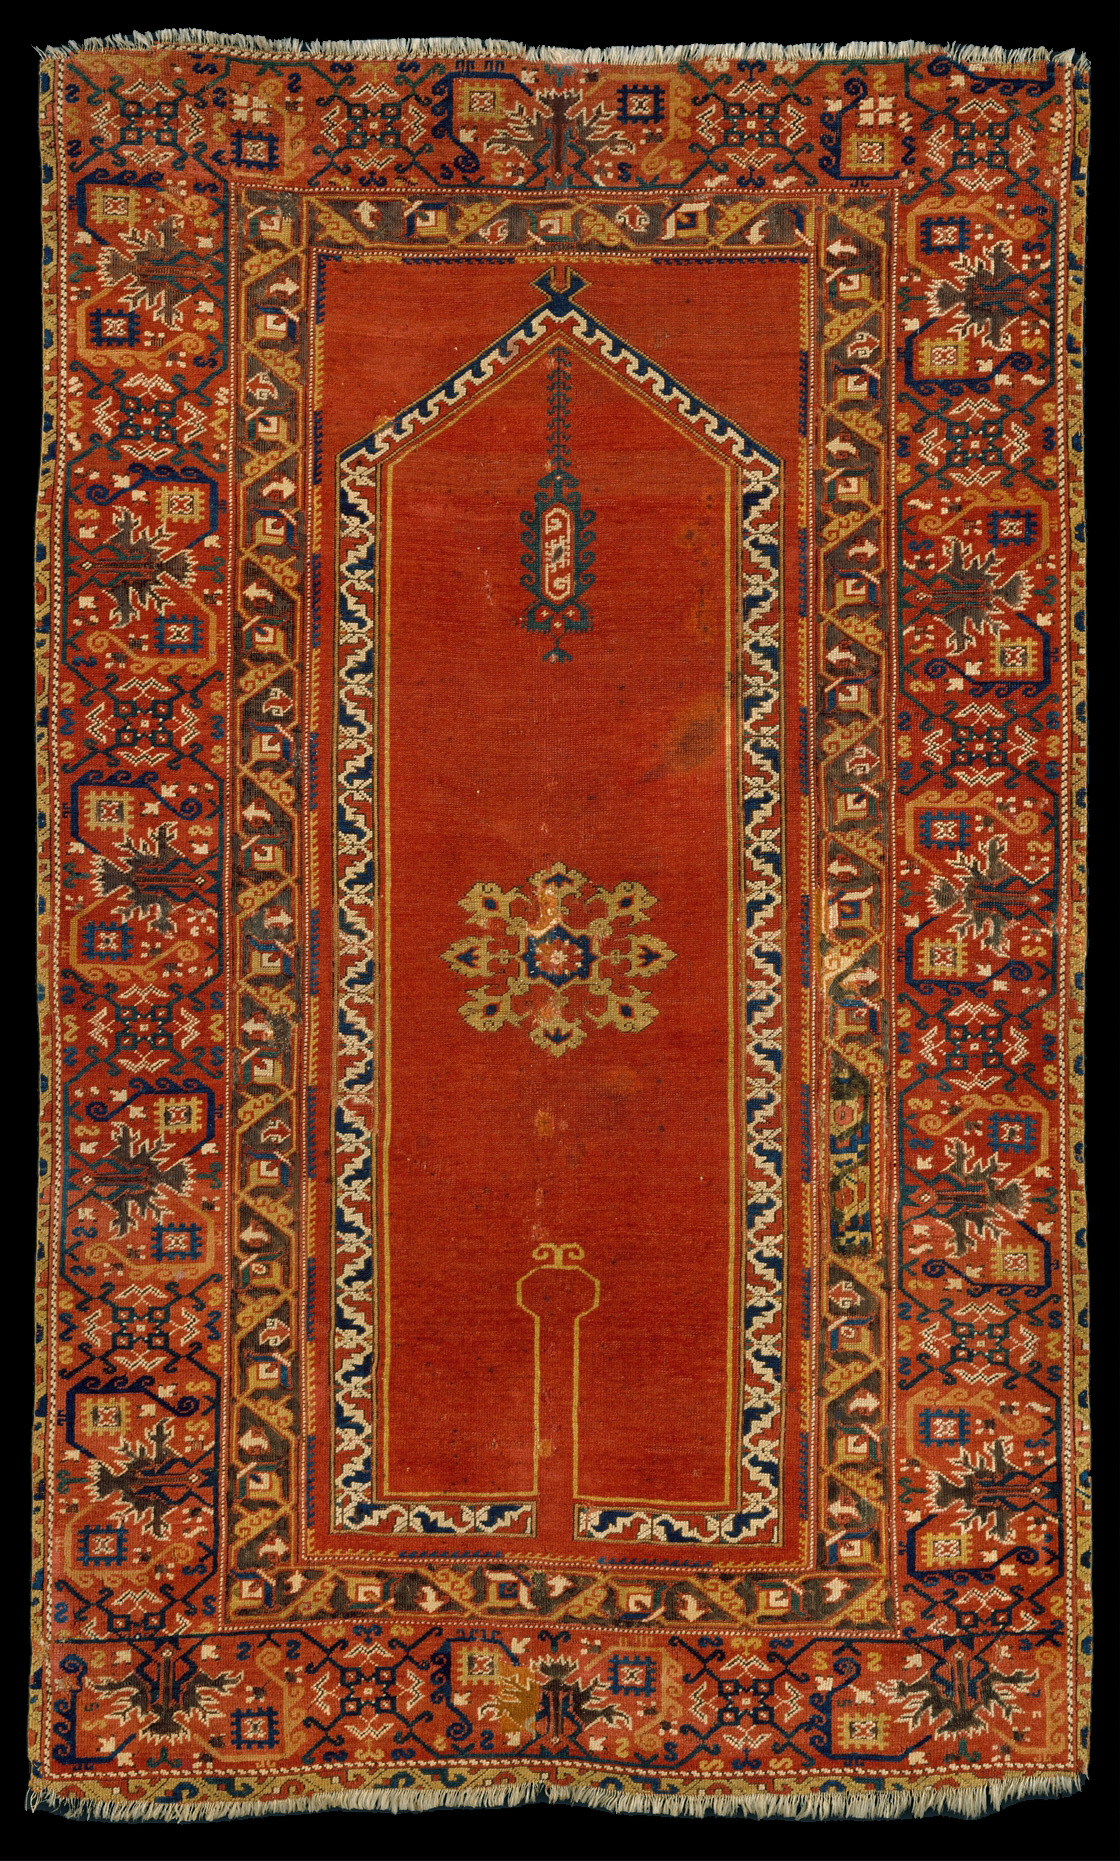 Bellni patterned workshop carpet 16th century Western Anatolia